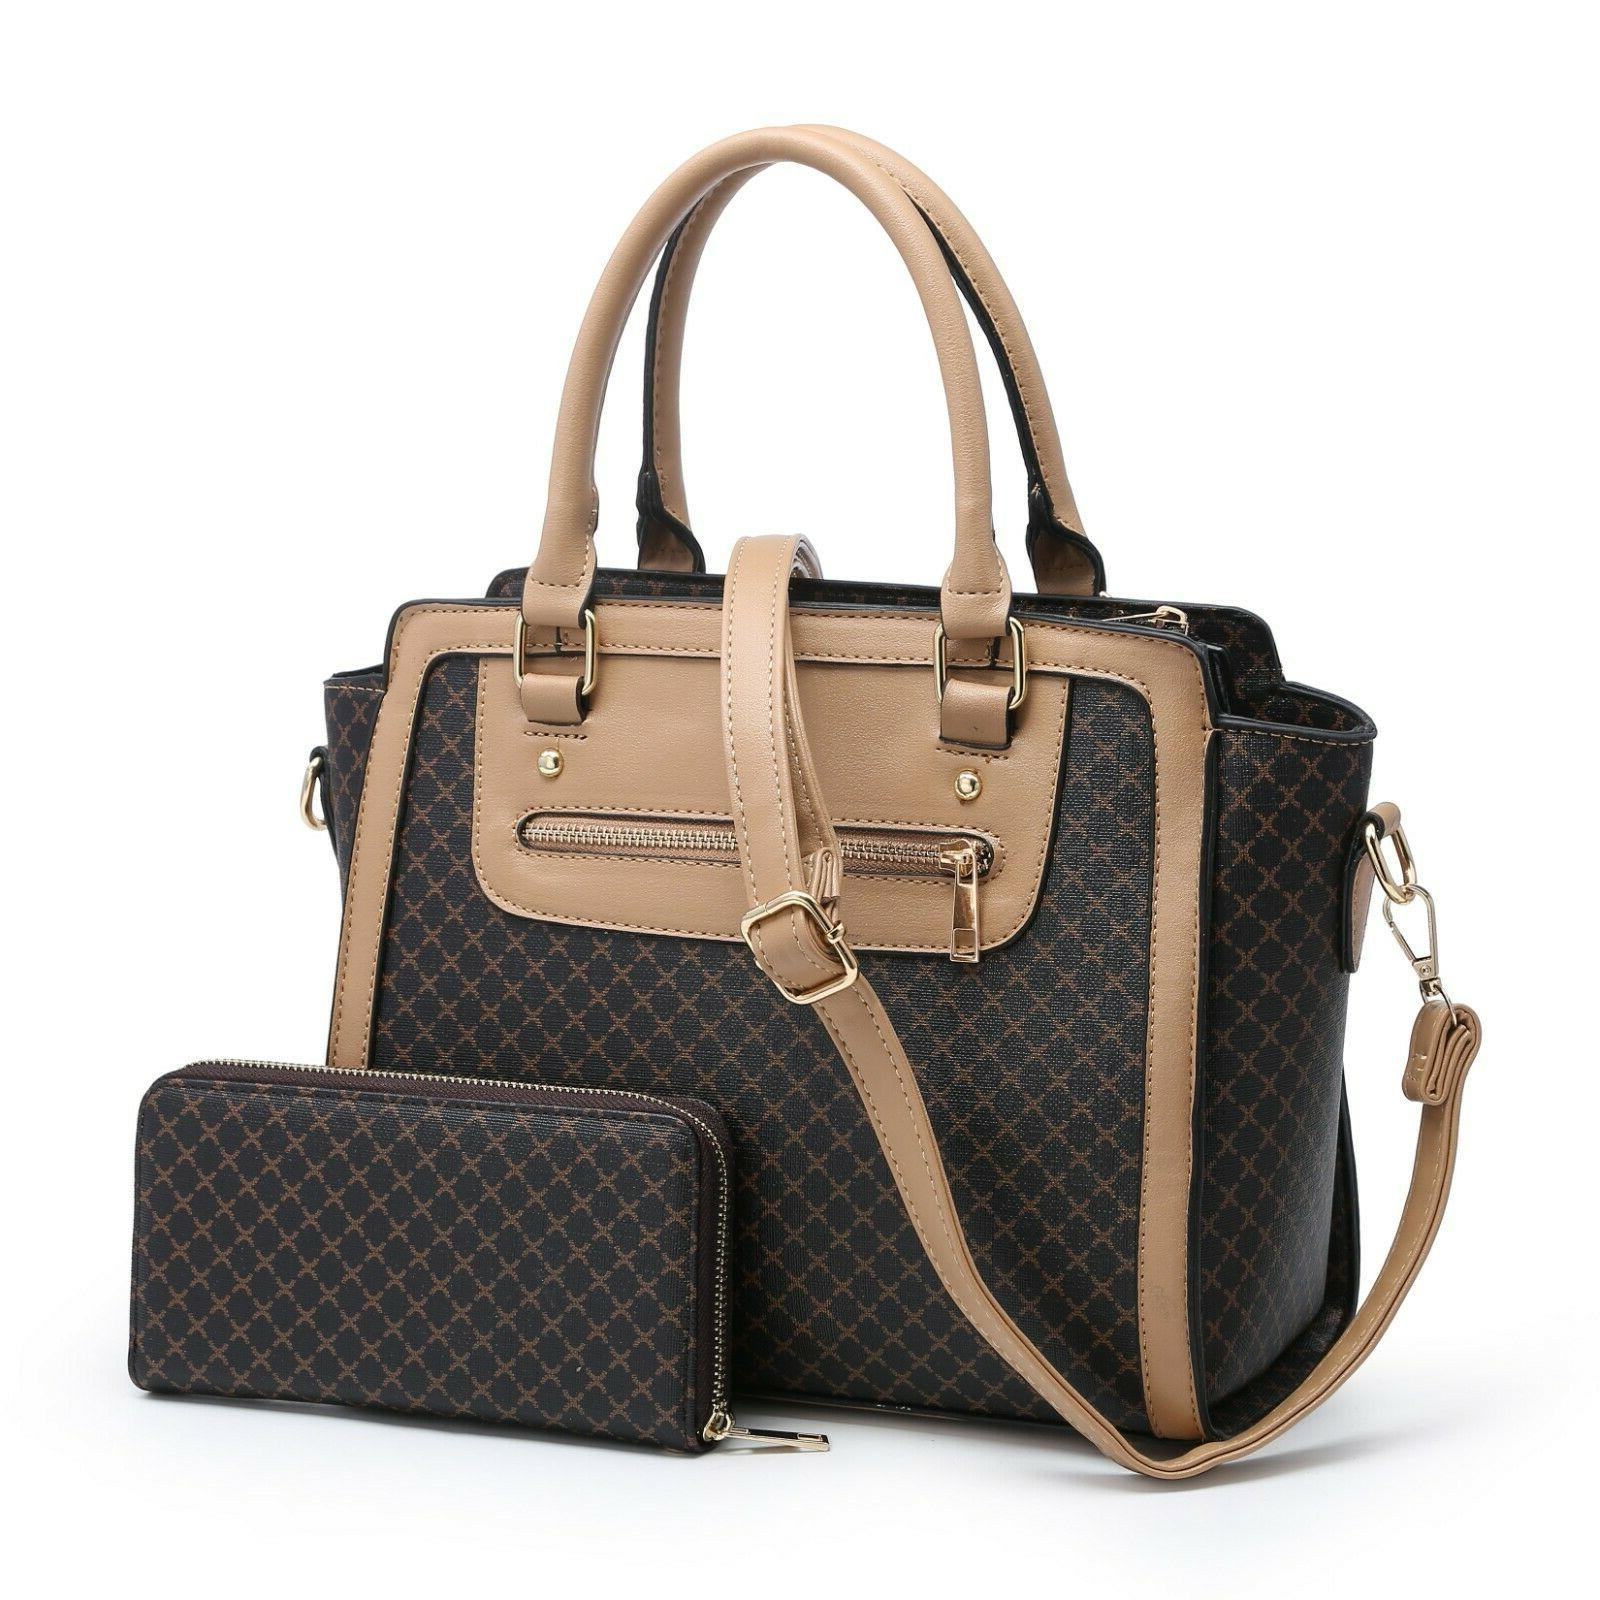 Women's Handbag in Shoulder Bag Arrival